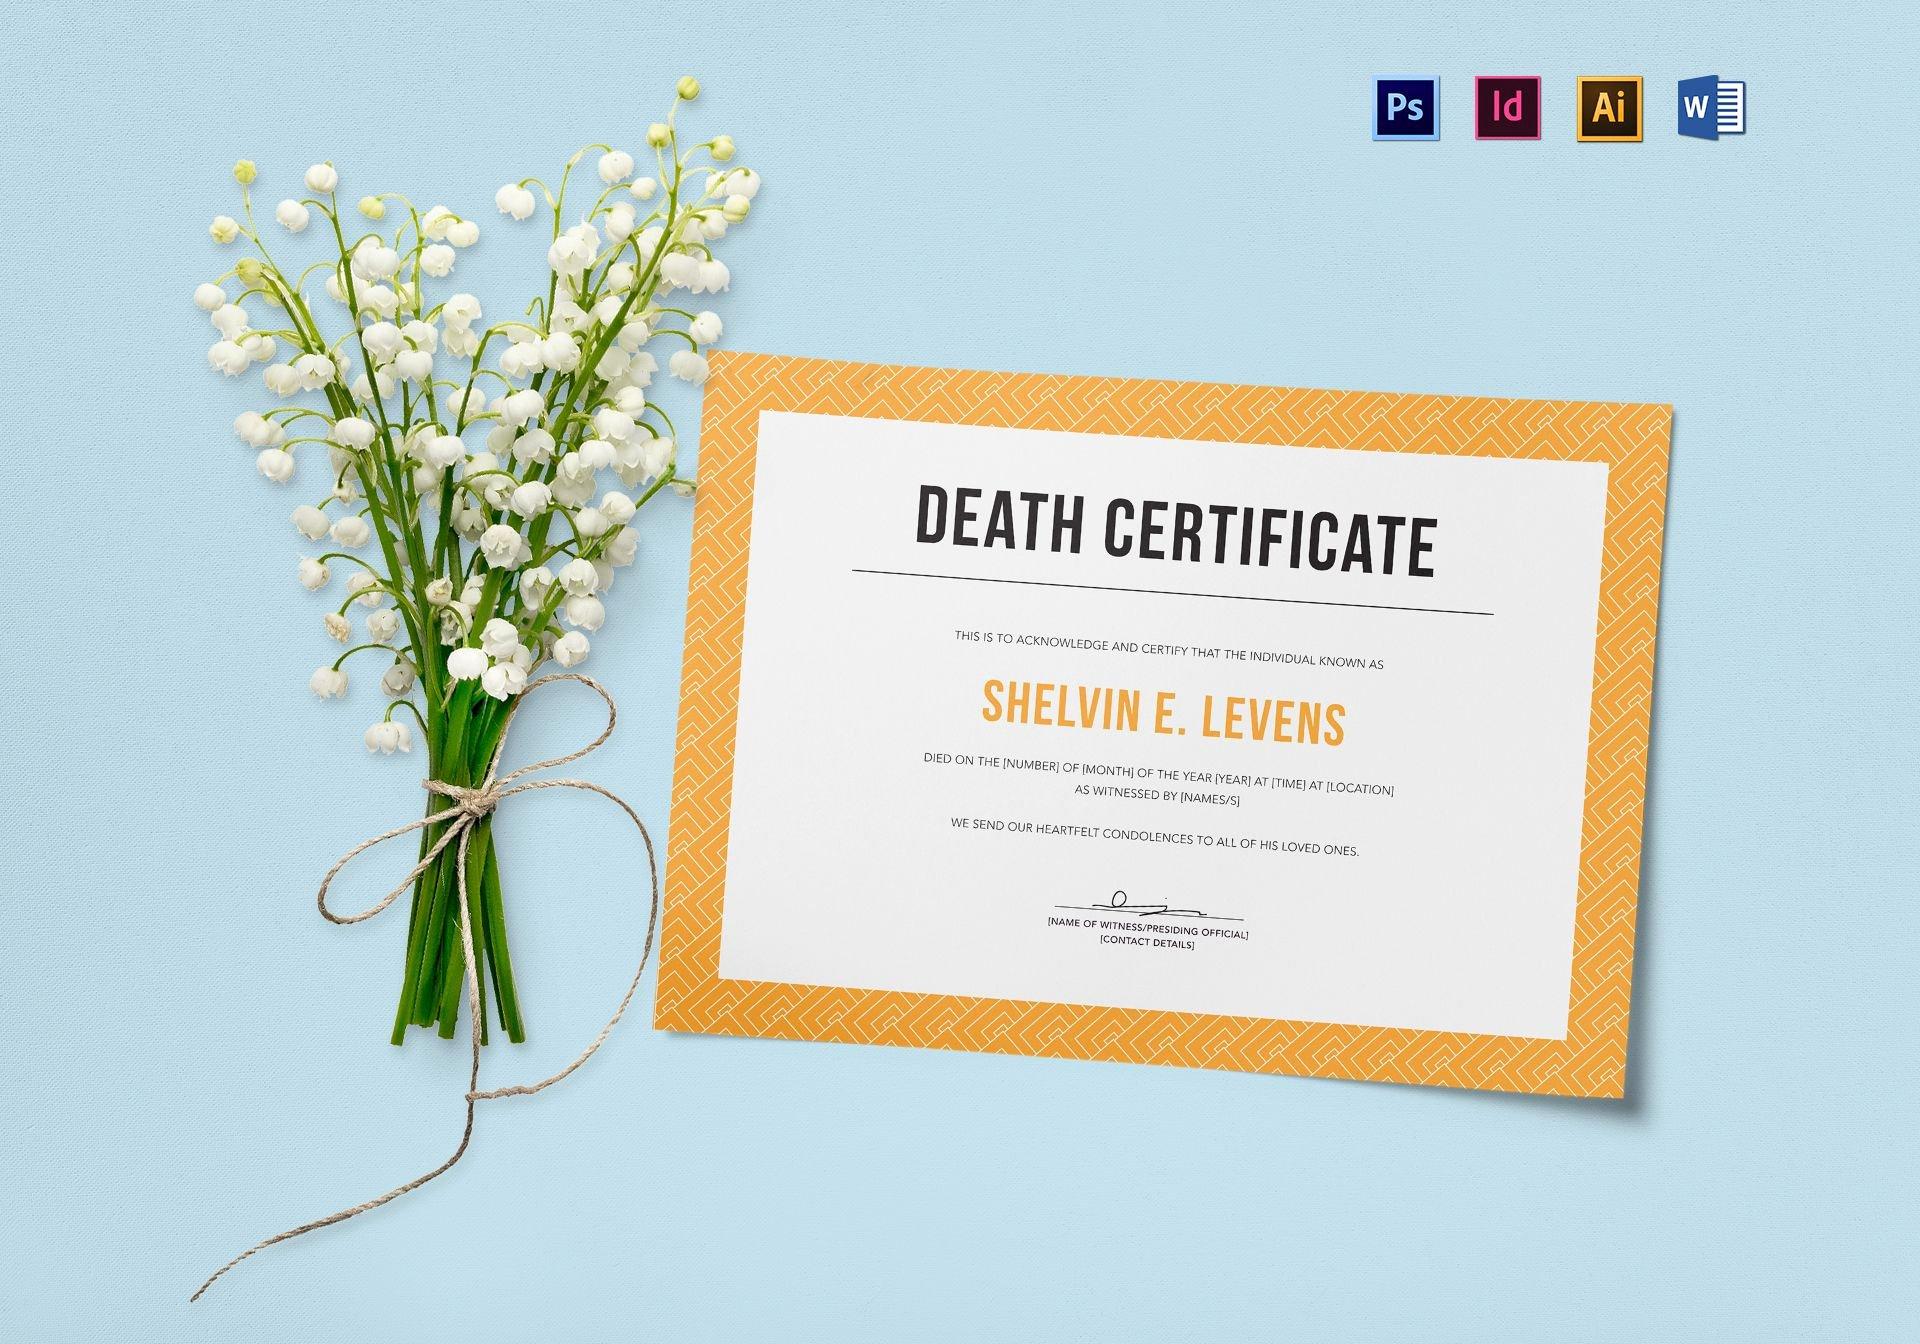 Death Certificate Template Word Unique Death Certificate Design Template In Psd Word